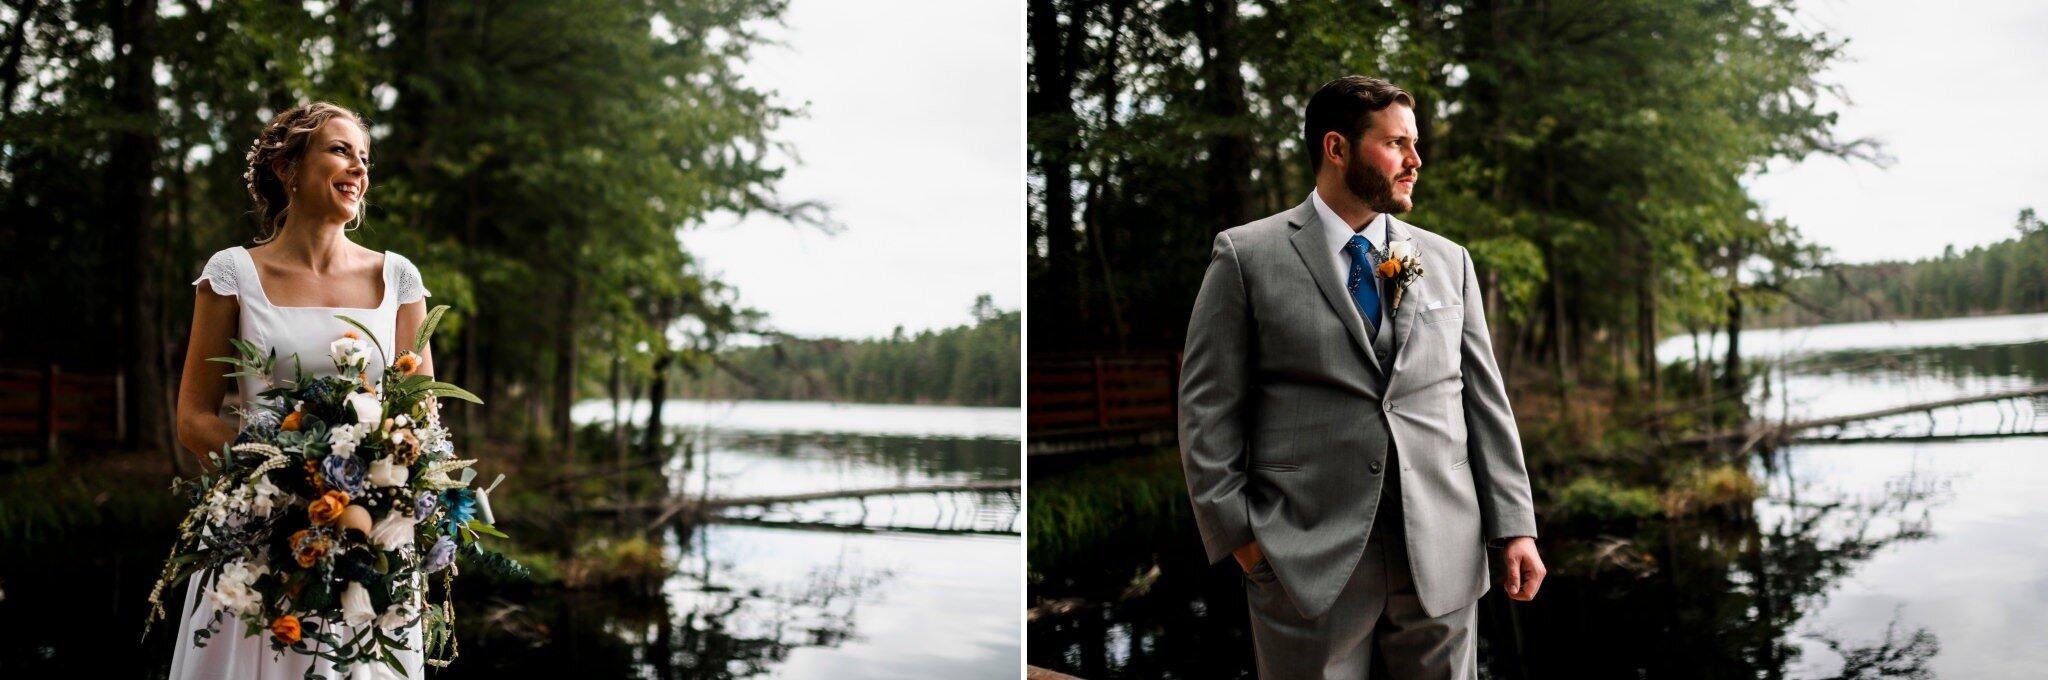 Niemann-Camp-Inawendiwin-New-Jersey-Wedding-Photographer-44.JPG